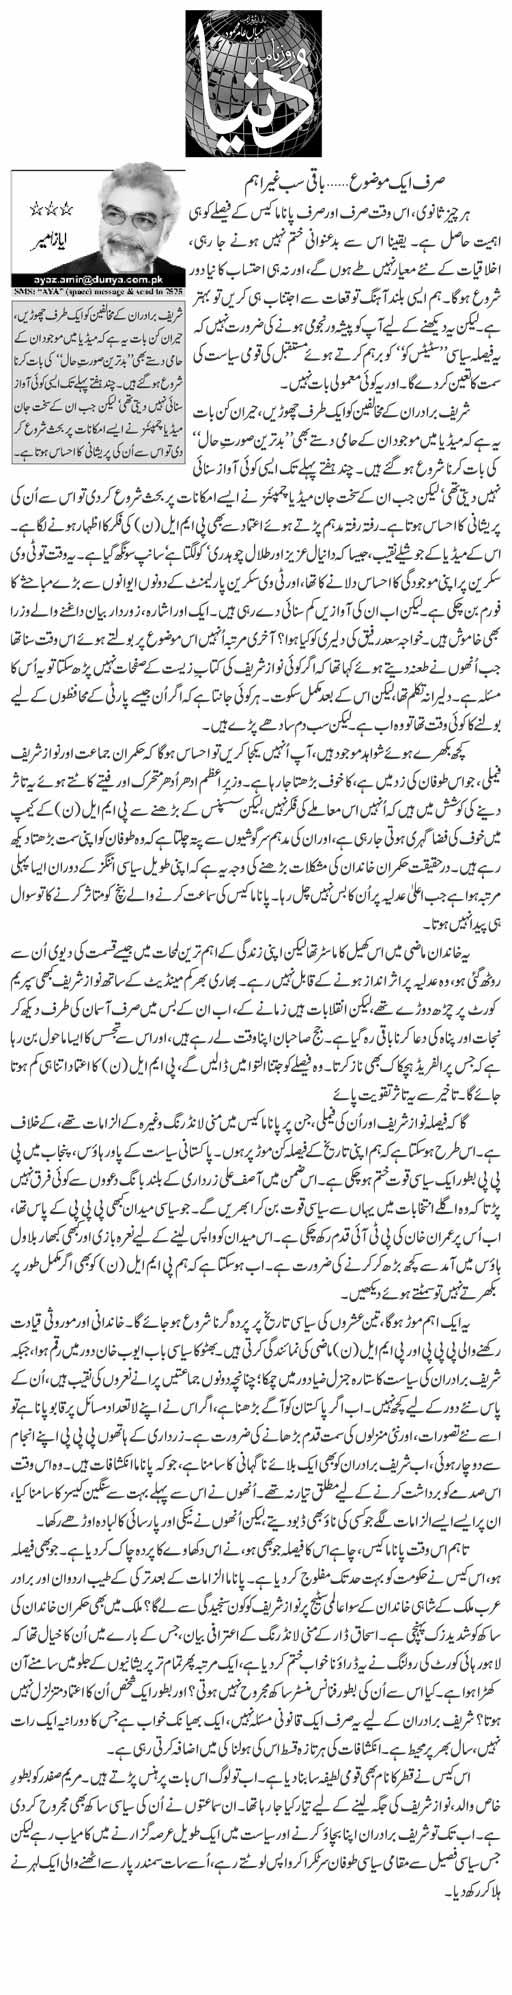 Sirf Aik Mauzo, Baqi Sab Ghair Ahem   Ayaz Amir   Daily Urdu Columns